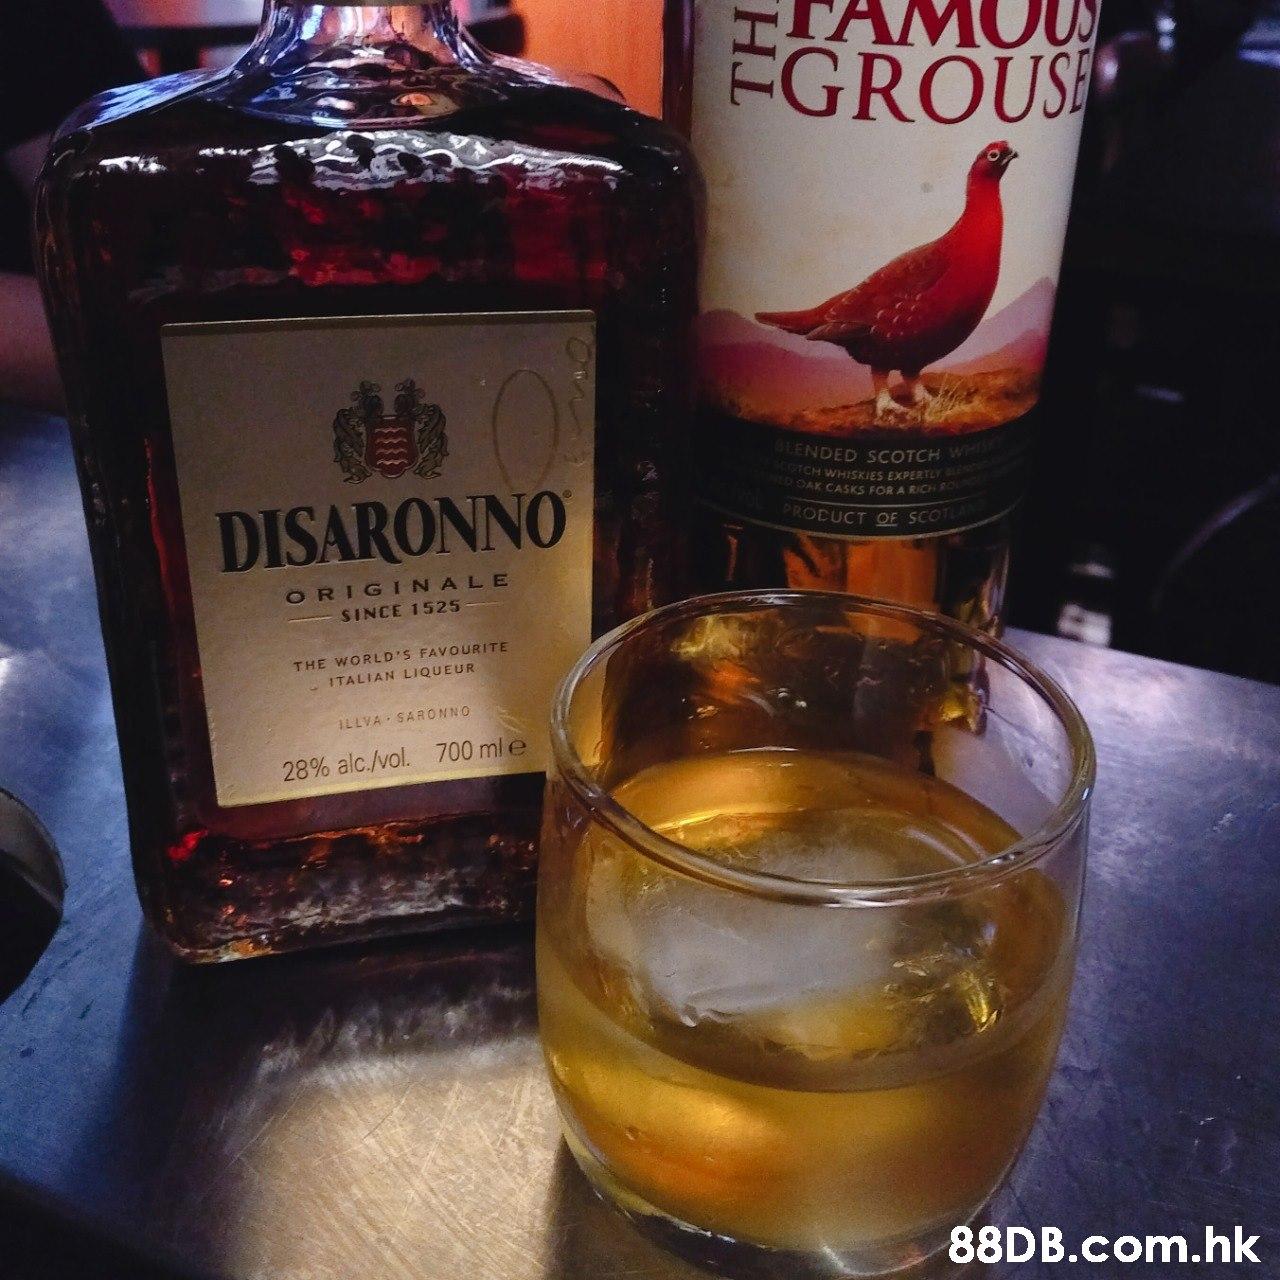 ÉGROUSE BLENDED S COTCH WHIS SCOTCH WHISKIES EXPERTLY BLENR OAK CASKS FOR A RICH R DISARONNO PROCUCT OE SCOTLA ORIGINALE SINCE 1525 THE WORLD'S FAVOURITE - ITALIAN LIQUEUR ILLVA - SARONNO 700 mle 28% alc./vol. .hk  Drink,Liqueur,Alcoholic beverage,Distilled beverage,Bottle